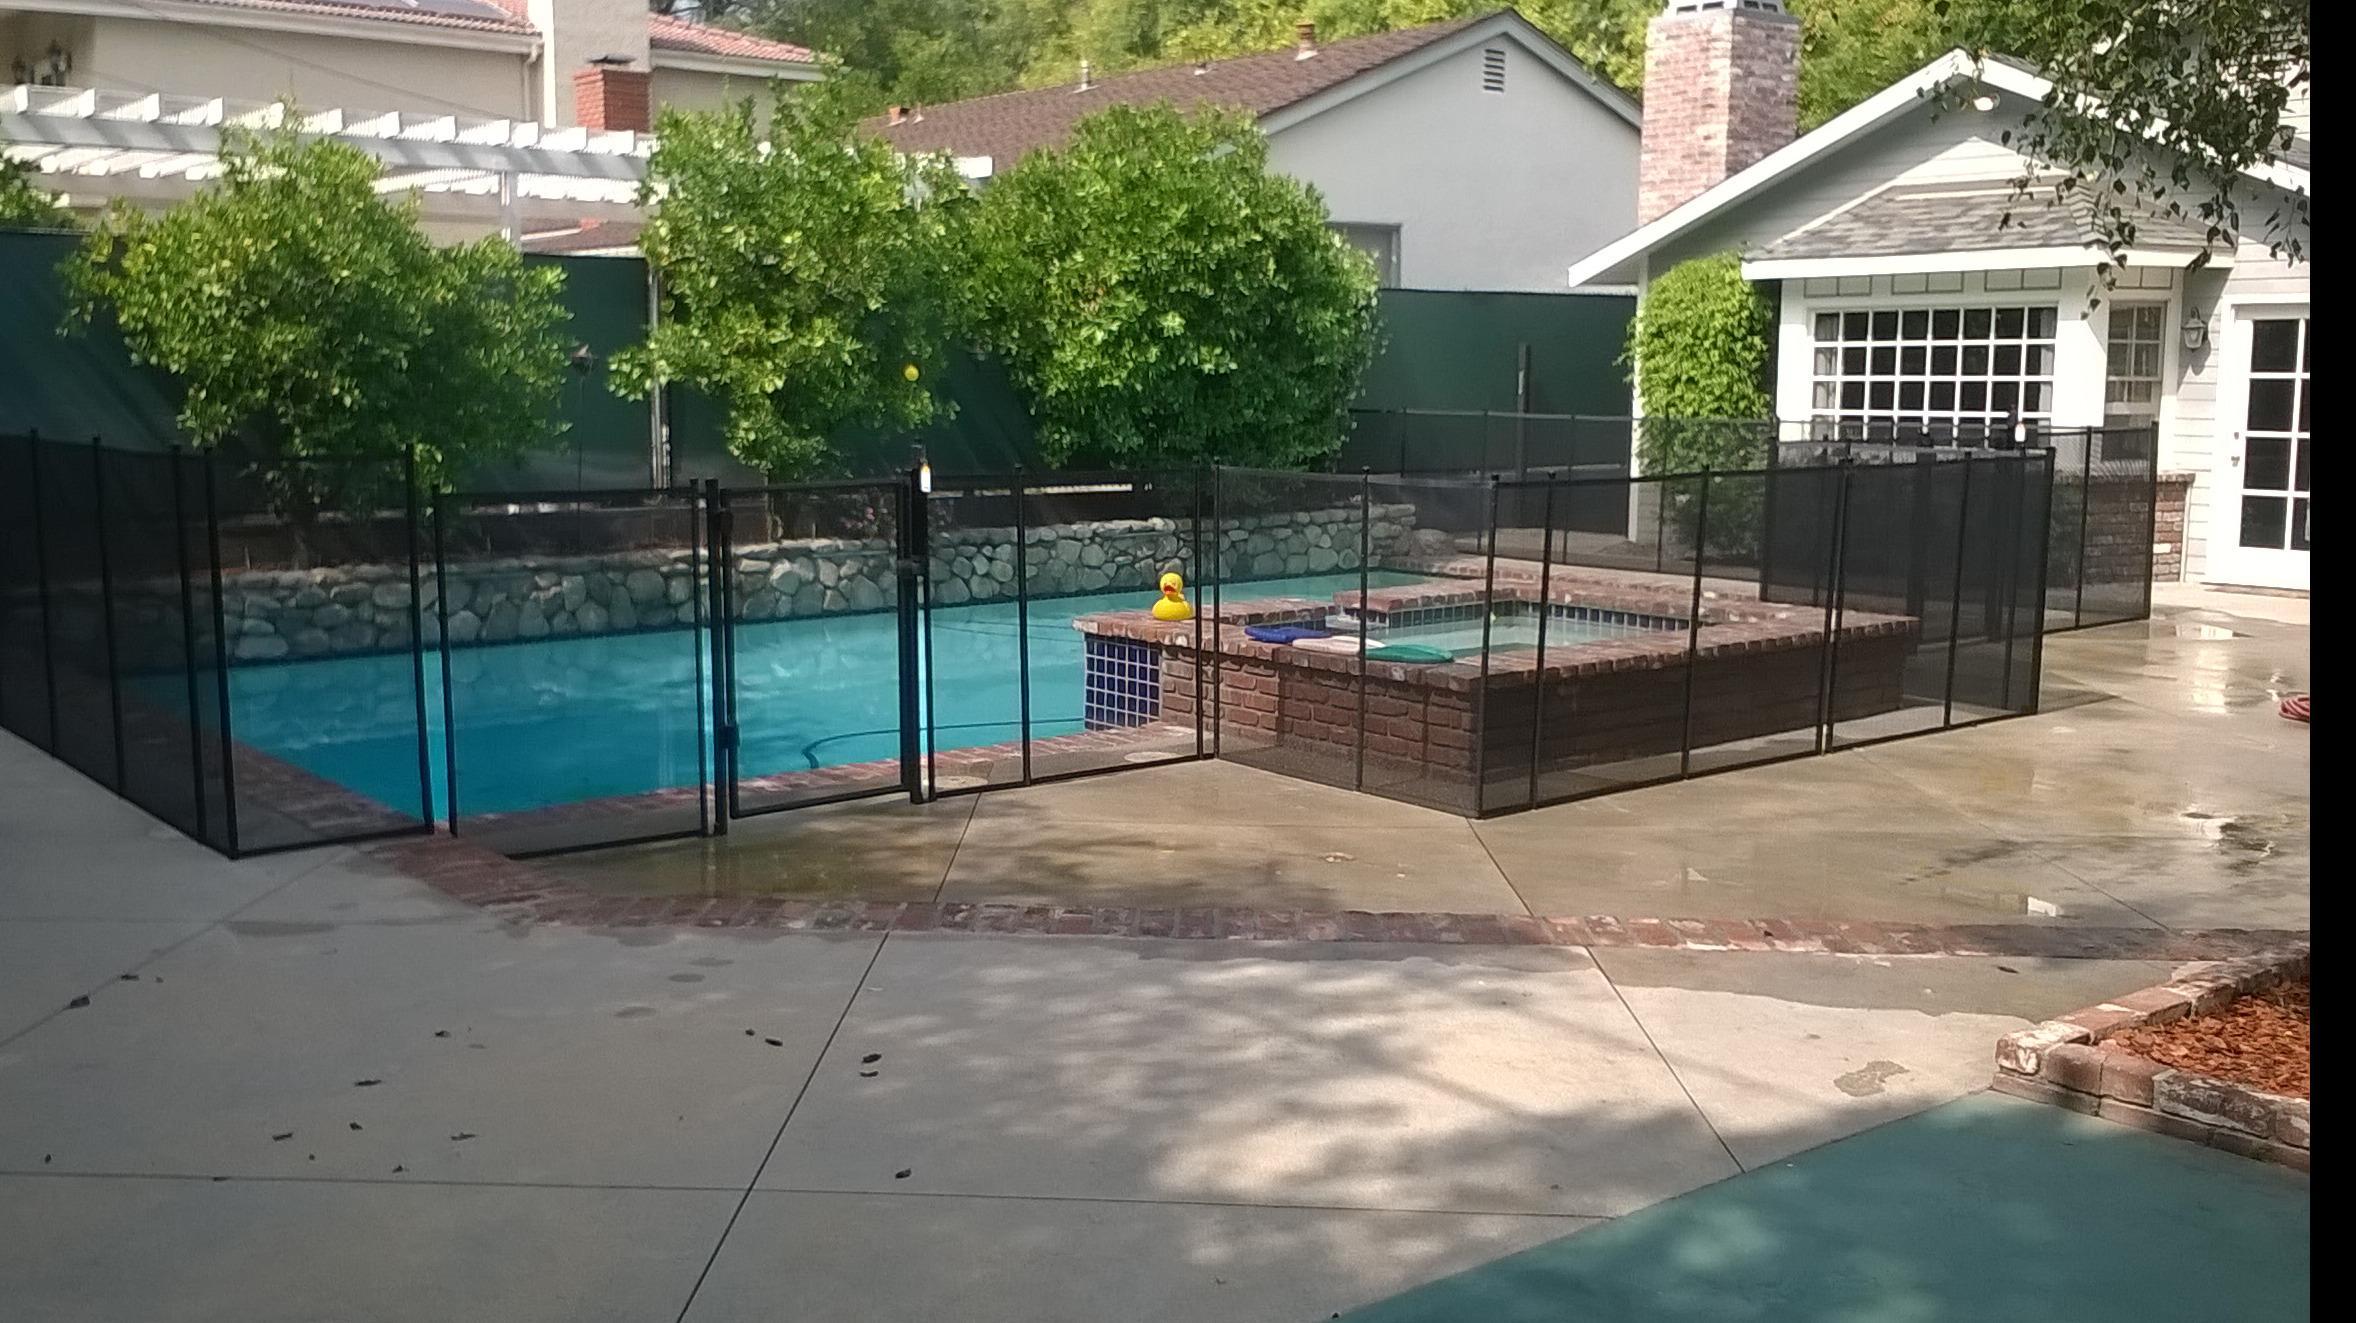 Nathans Pool Fence image 18